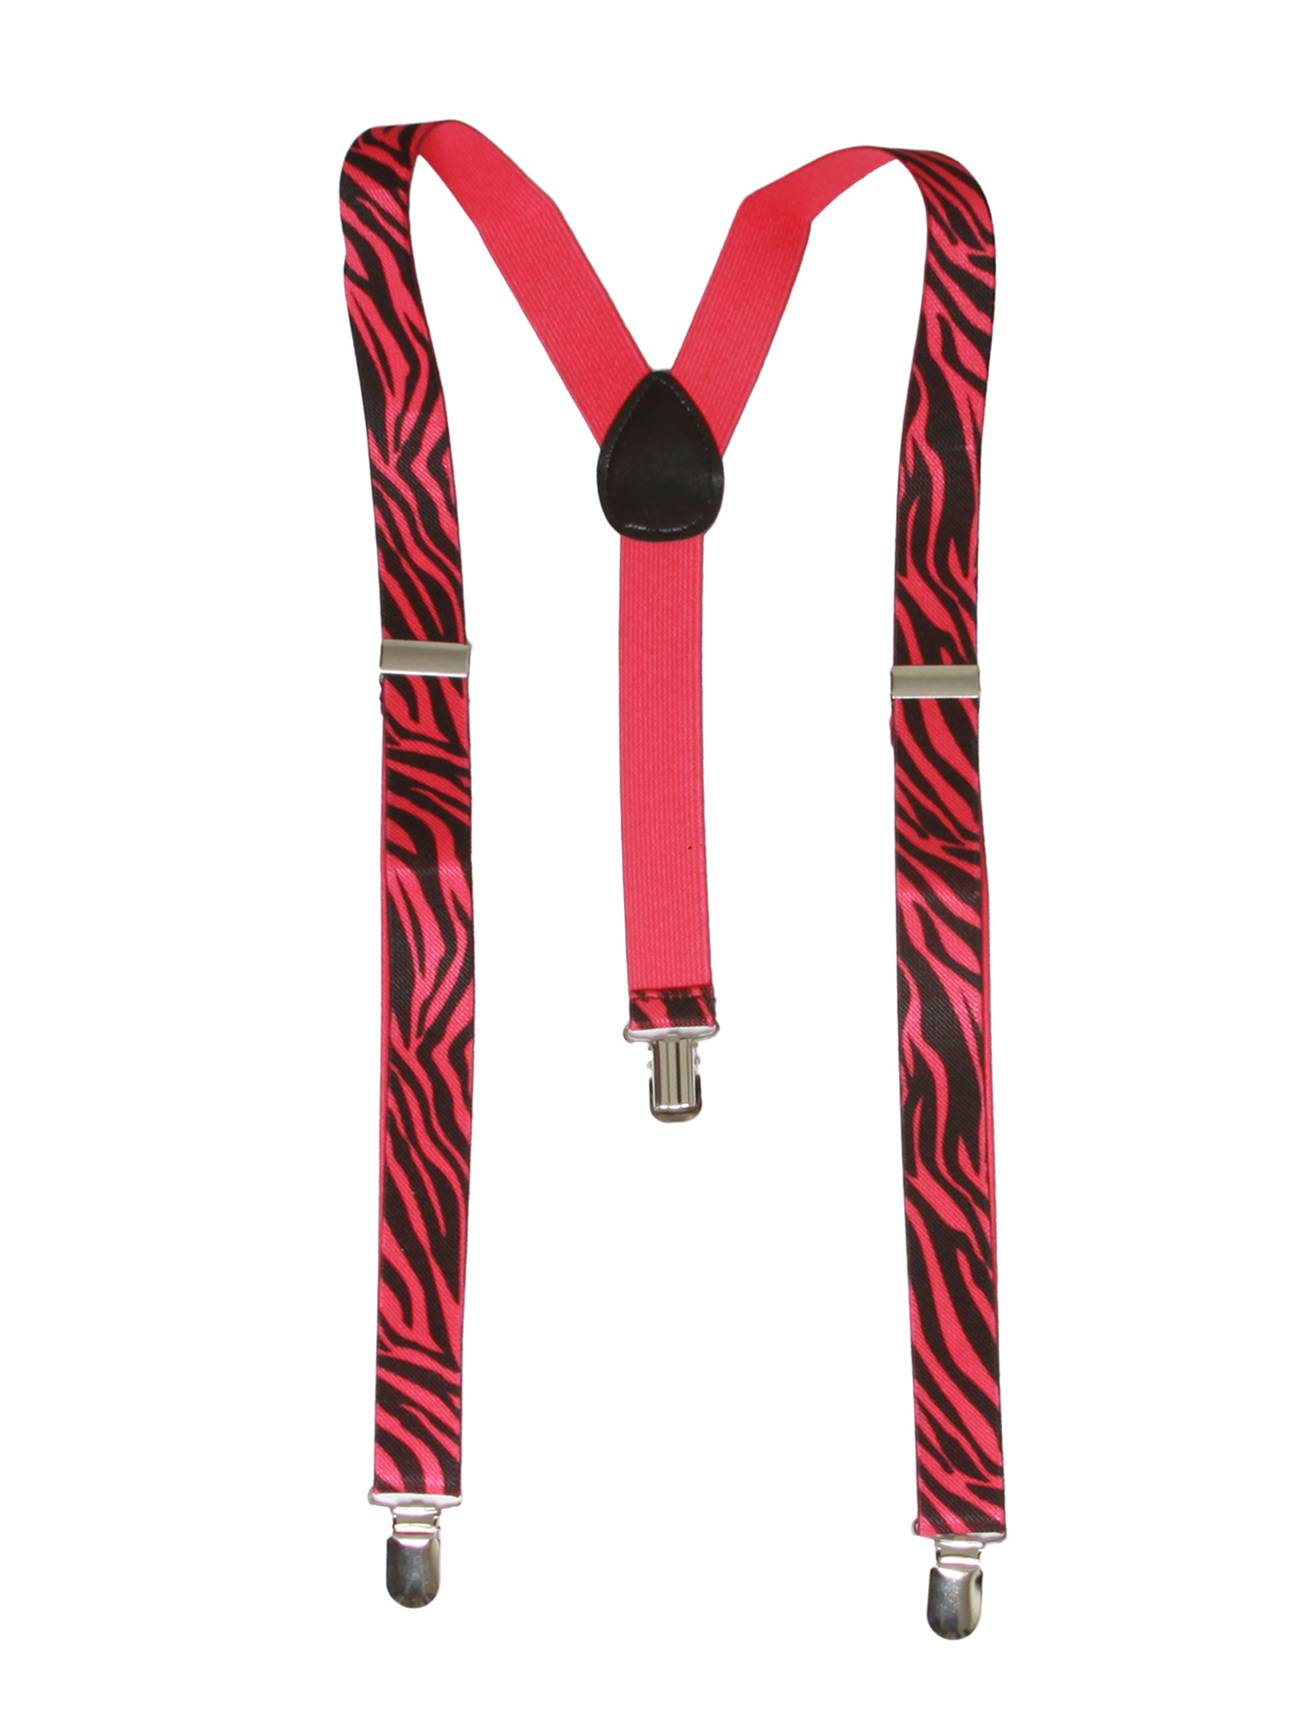 Zebra 3 Clip Stretchable Suspenders 2 pack-